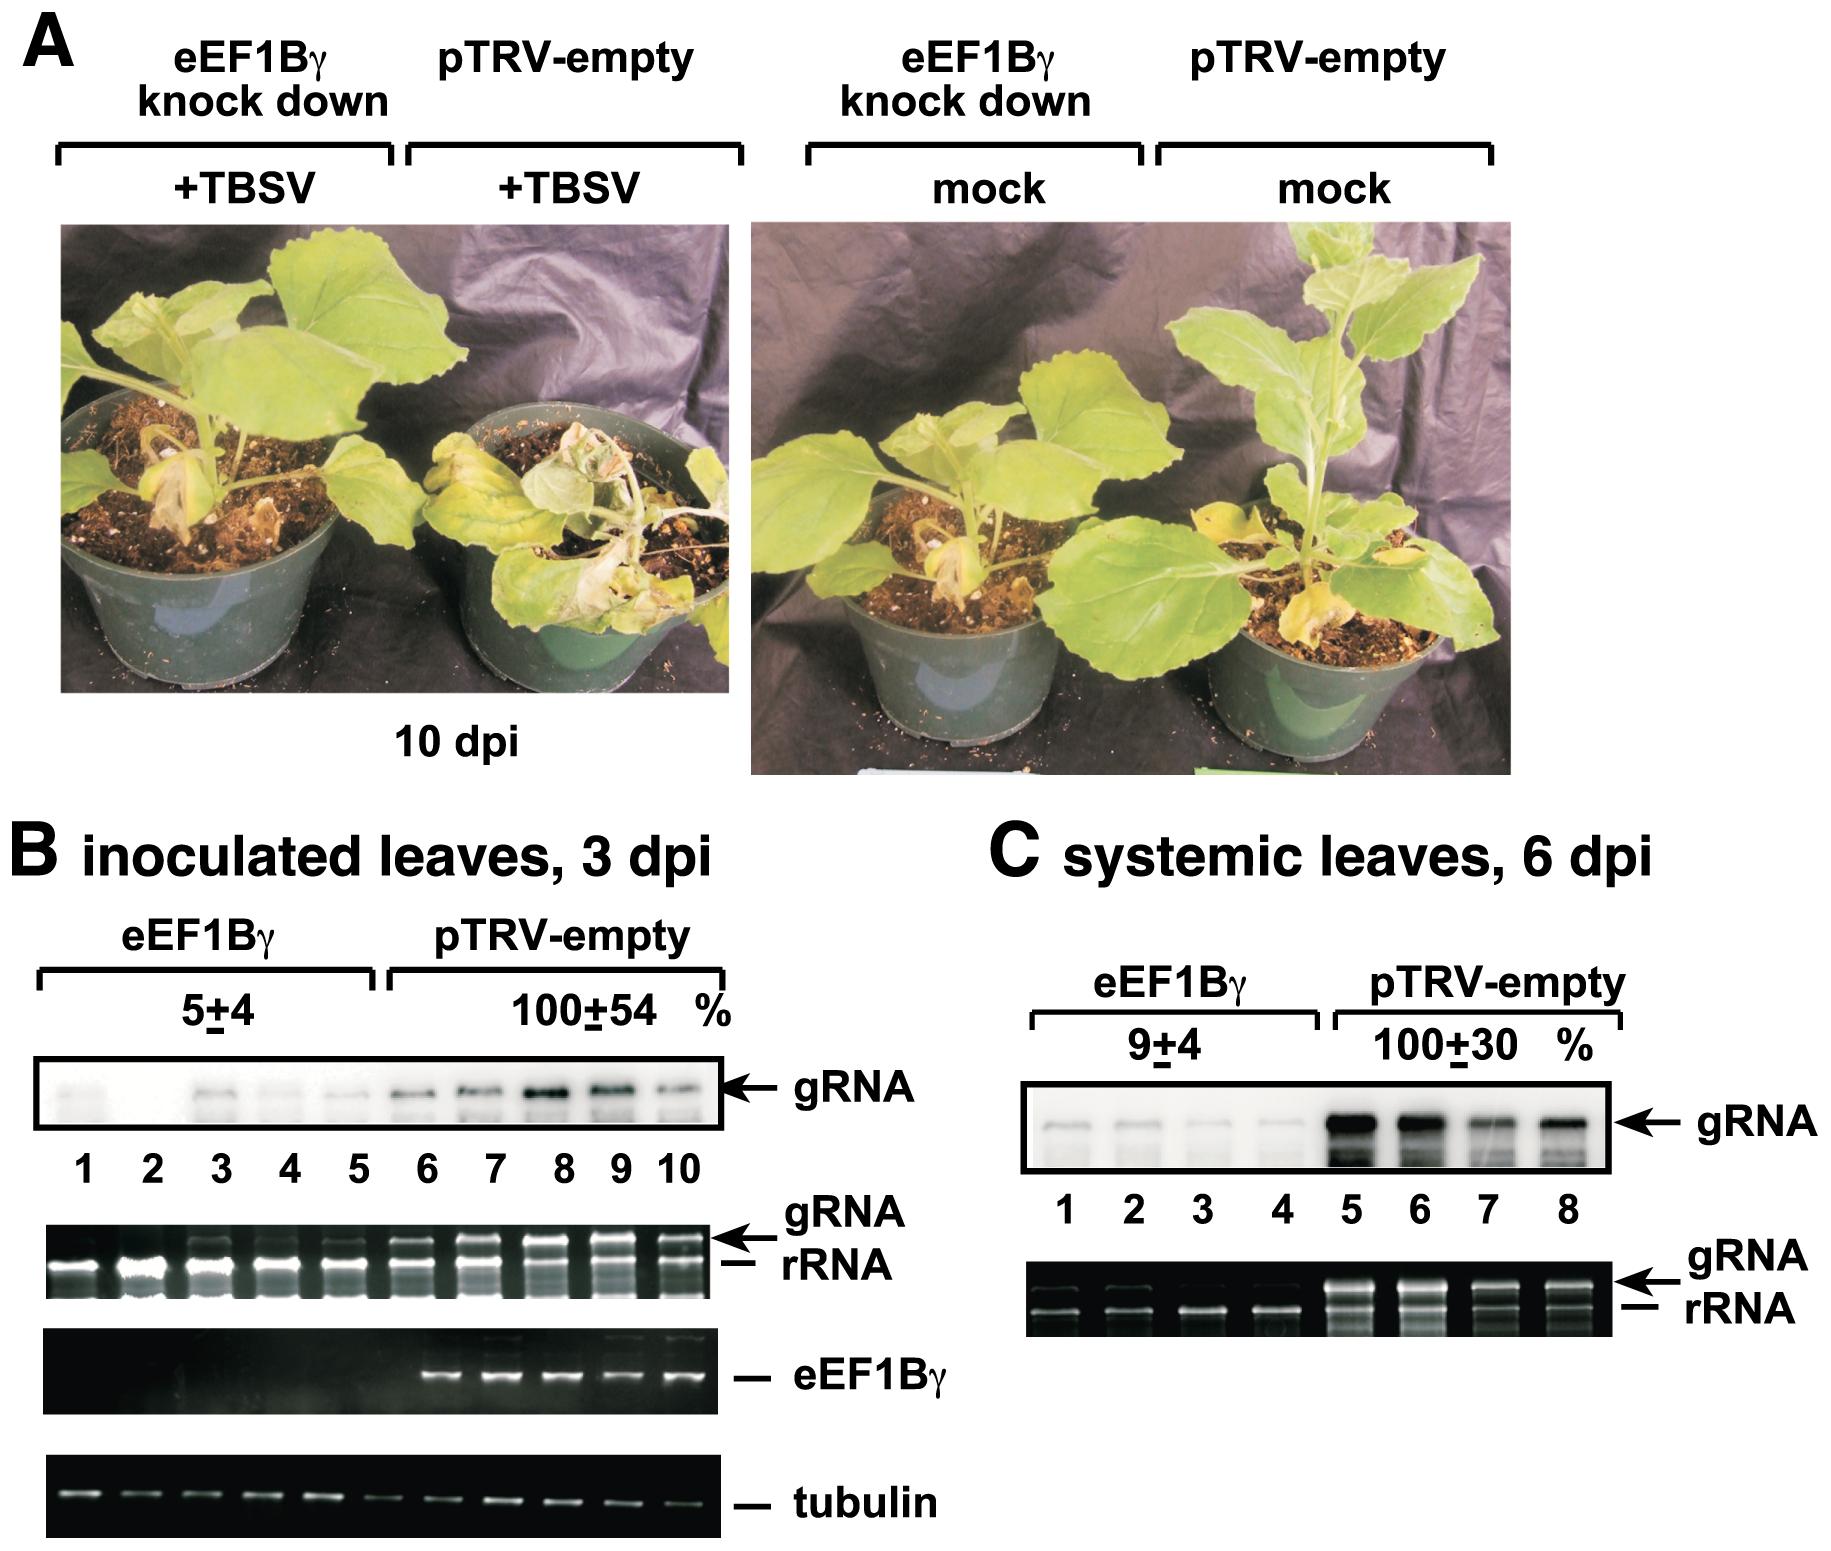 Knockdown of eEF1Bγ inhibits TBSV RNA replication in <i>N. benthamiana</i> plants.